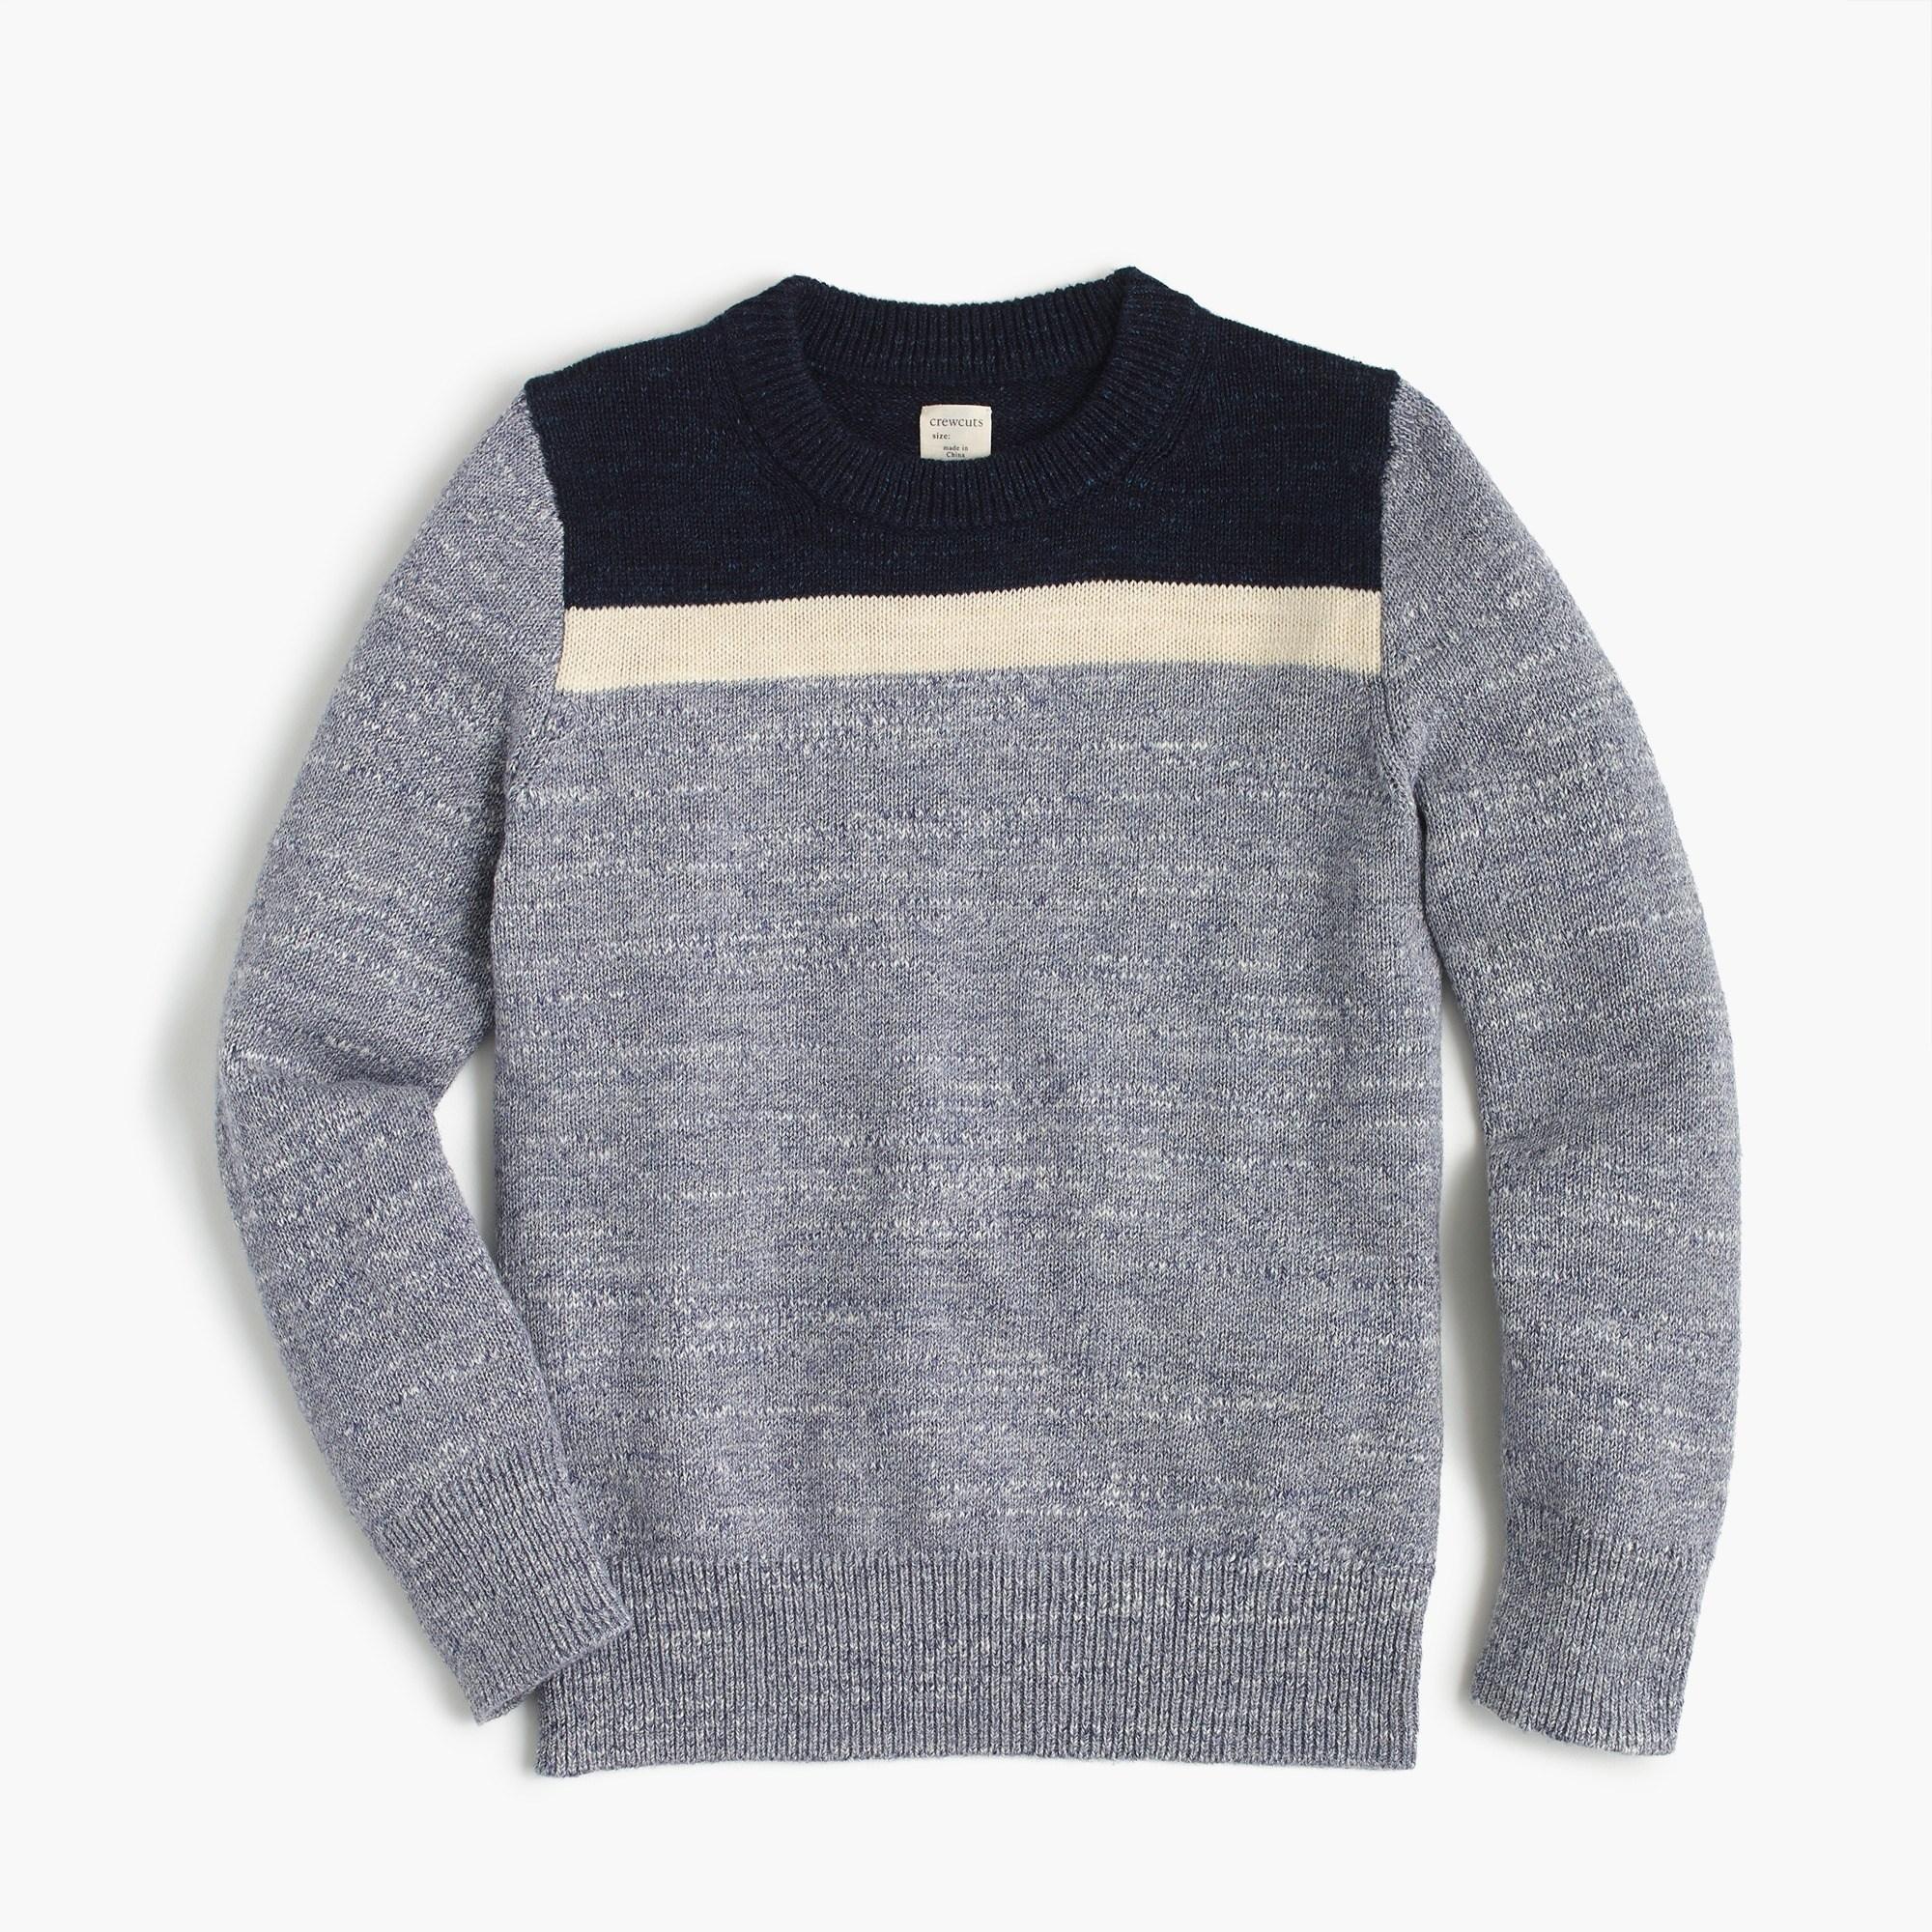 Boys' Colorblocked Cotton Crewneck Sweater - Boys' Sweaters   J.Crew